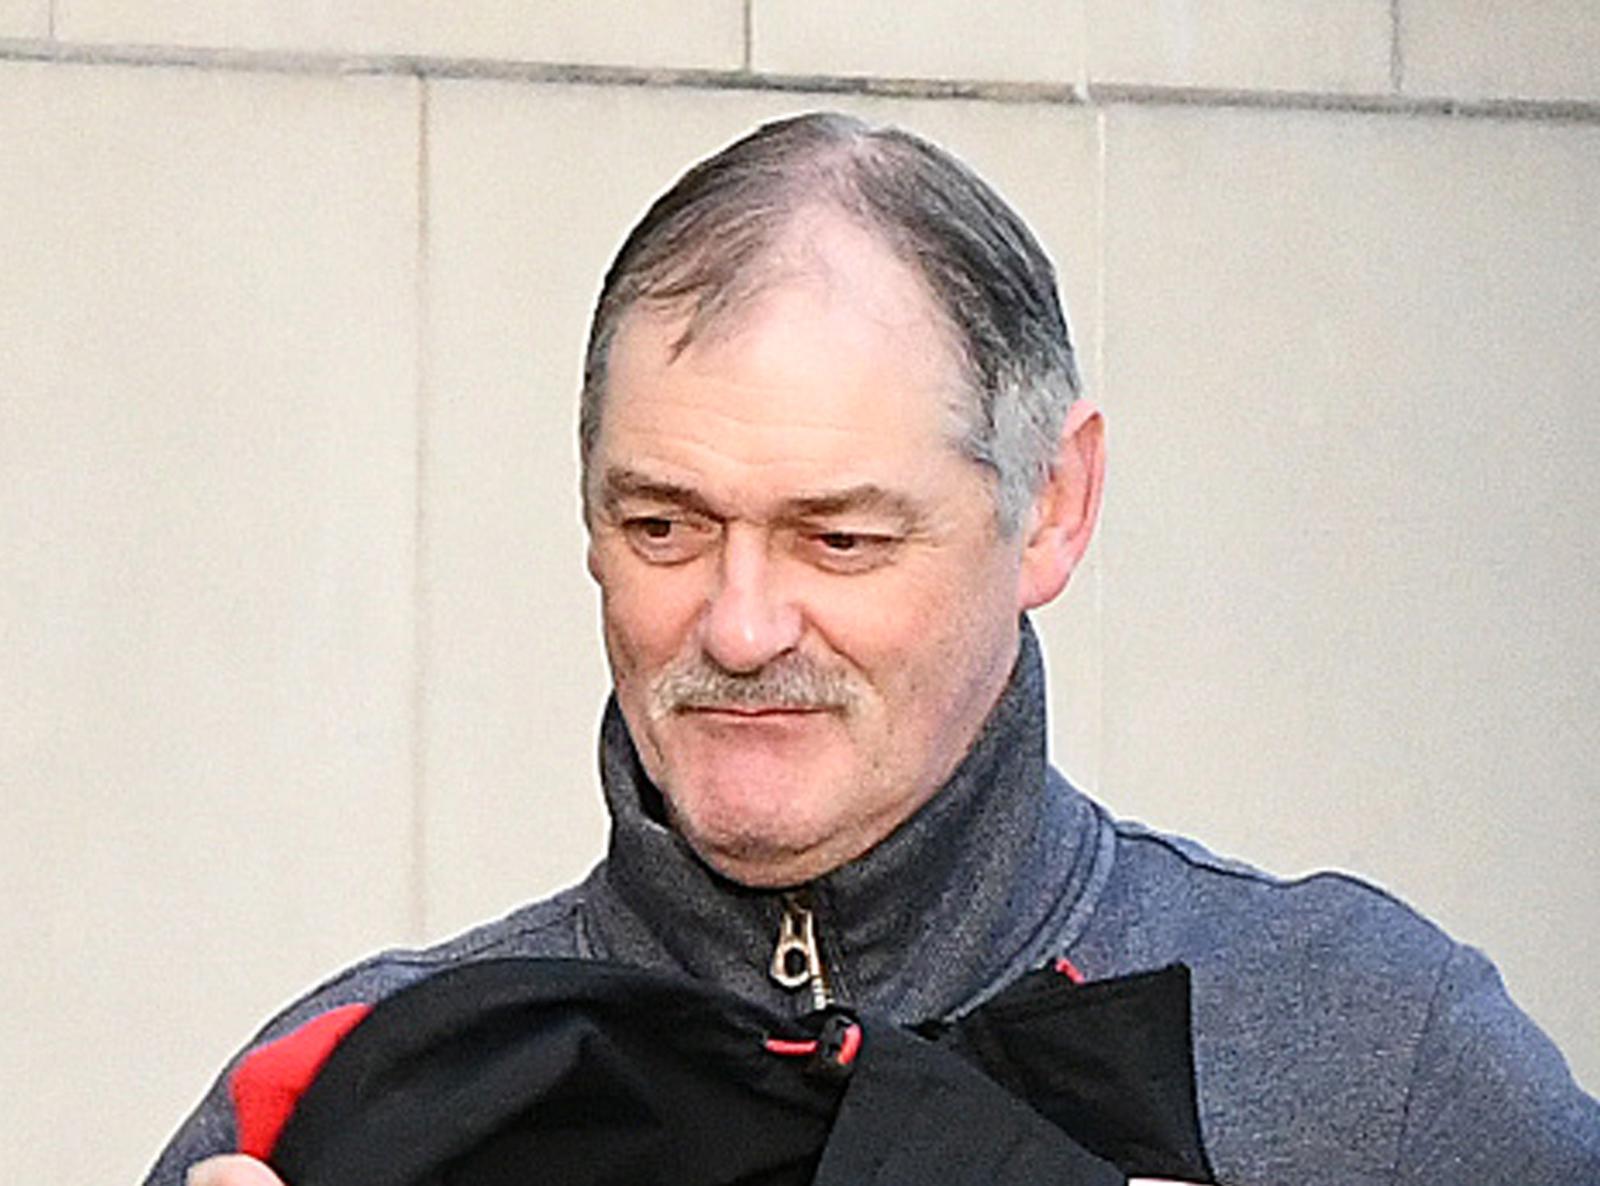 CONDEMNATION: Murder victim Daniel McClean